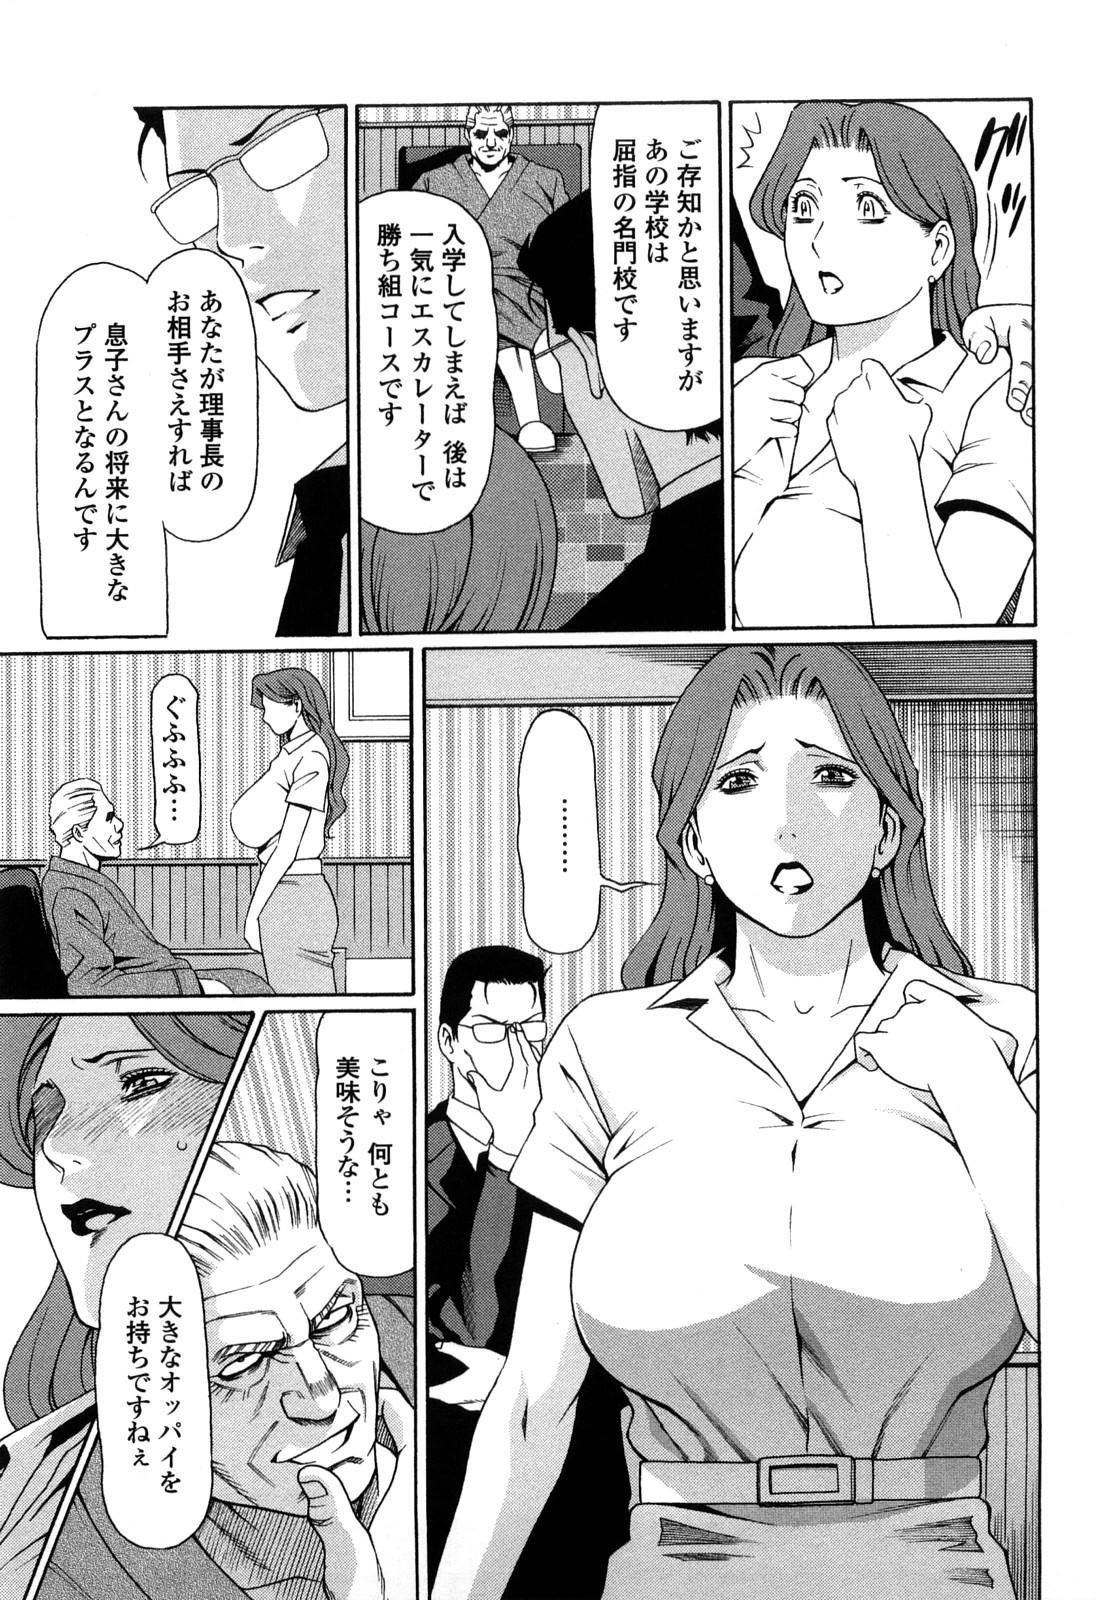 [Takasugi Kou] Kindan no Haha-Ana - Immorality Love-Hole [Decensored] 92